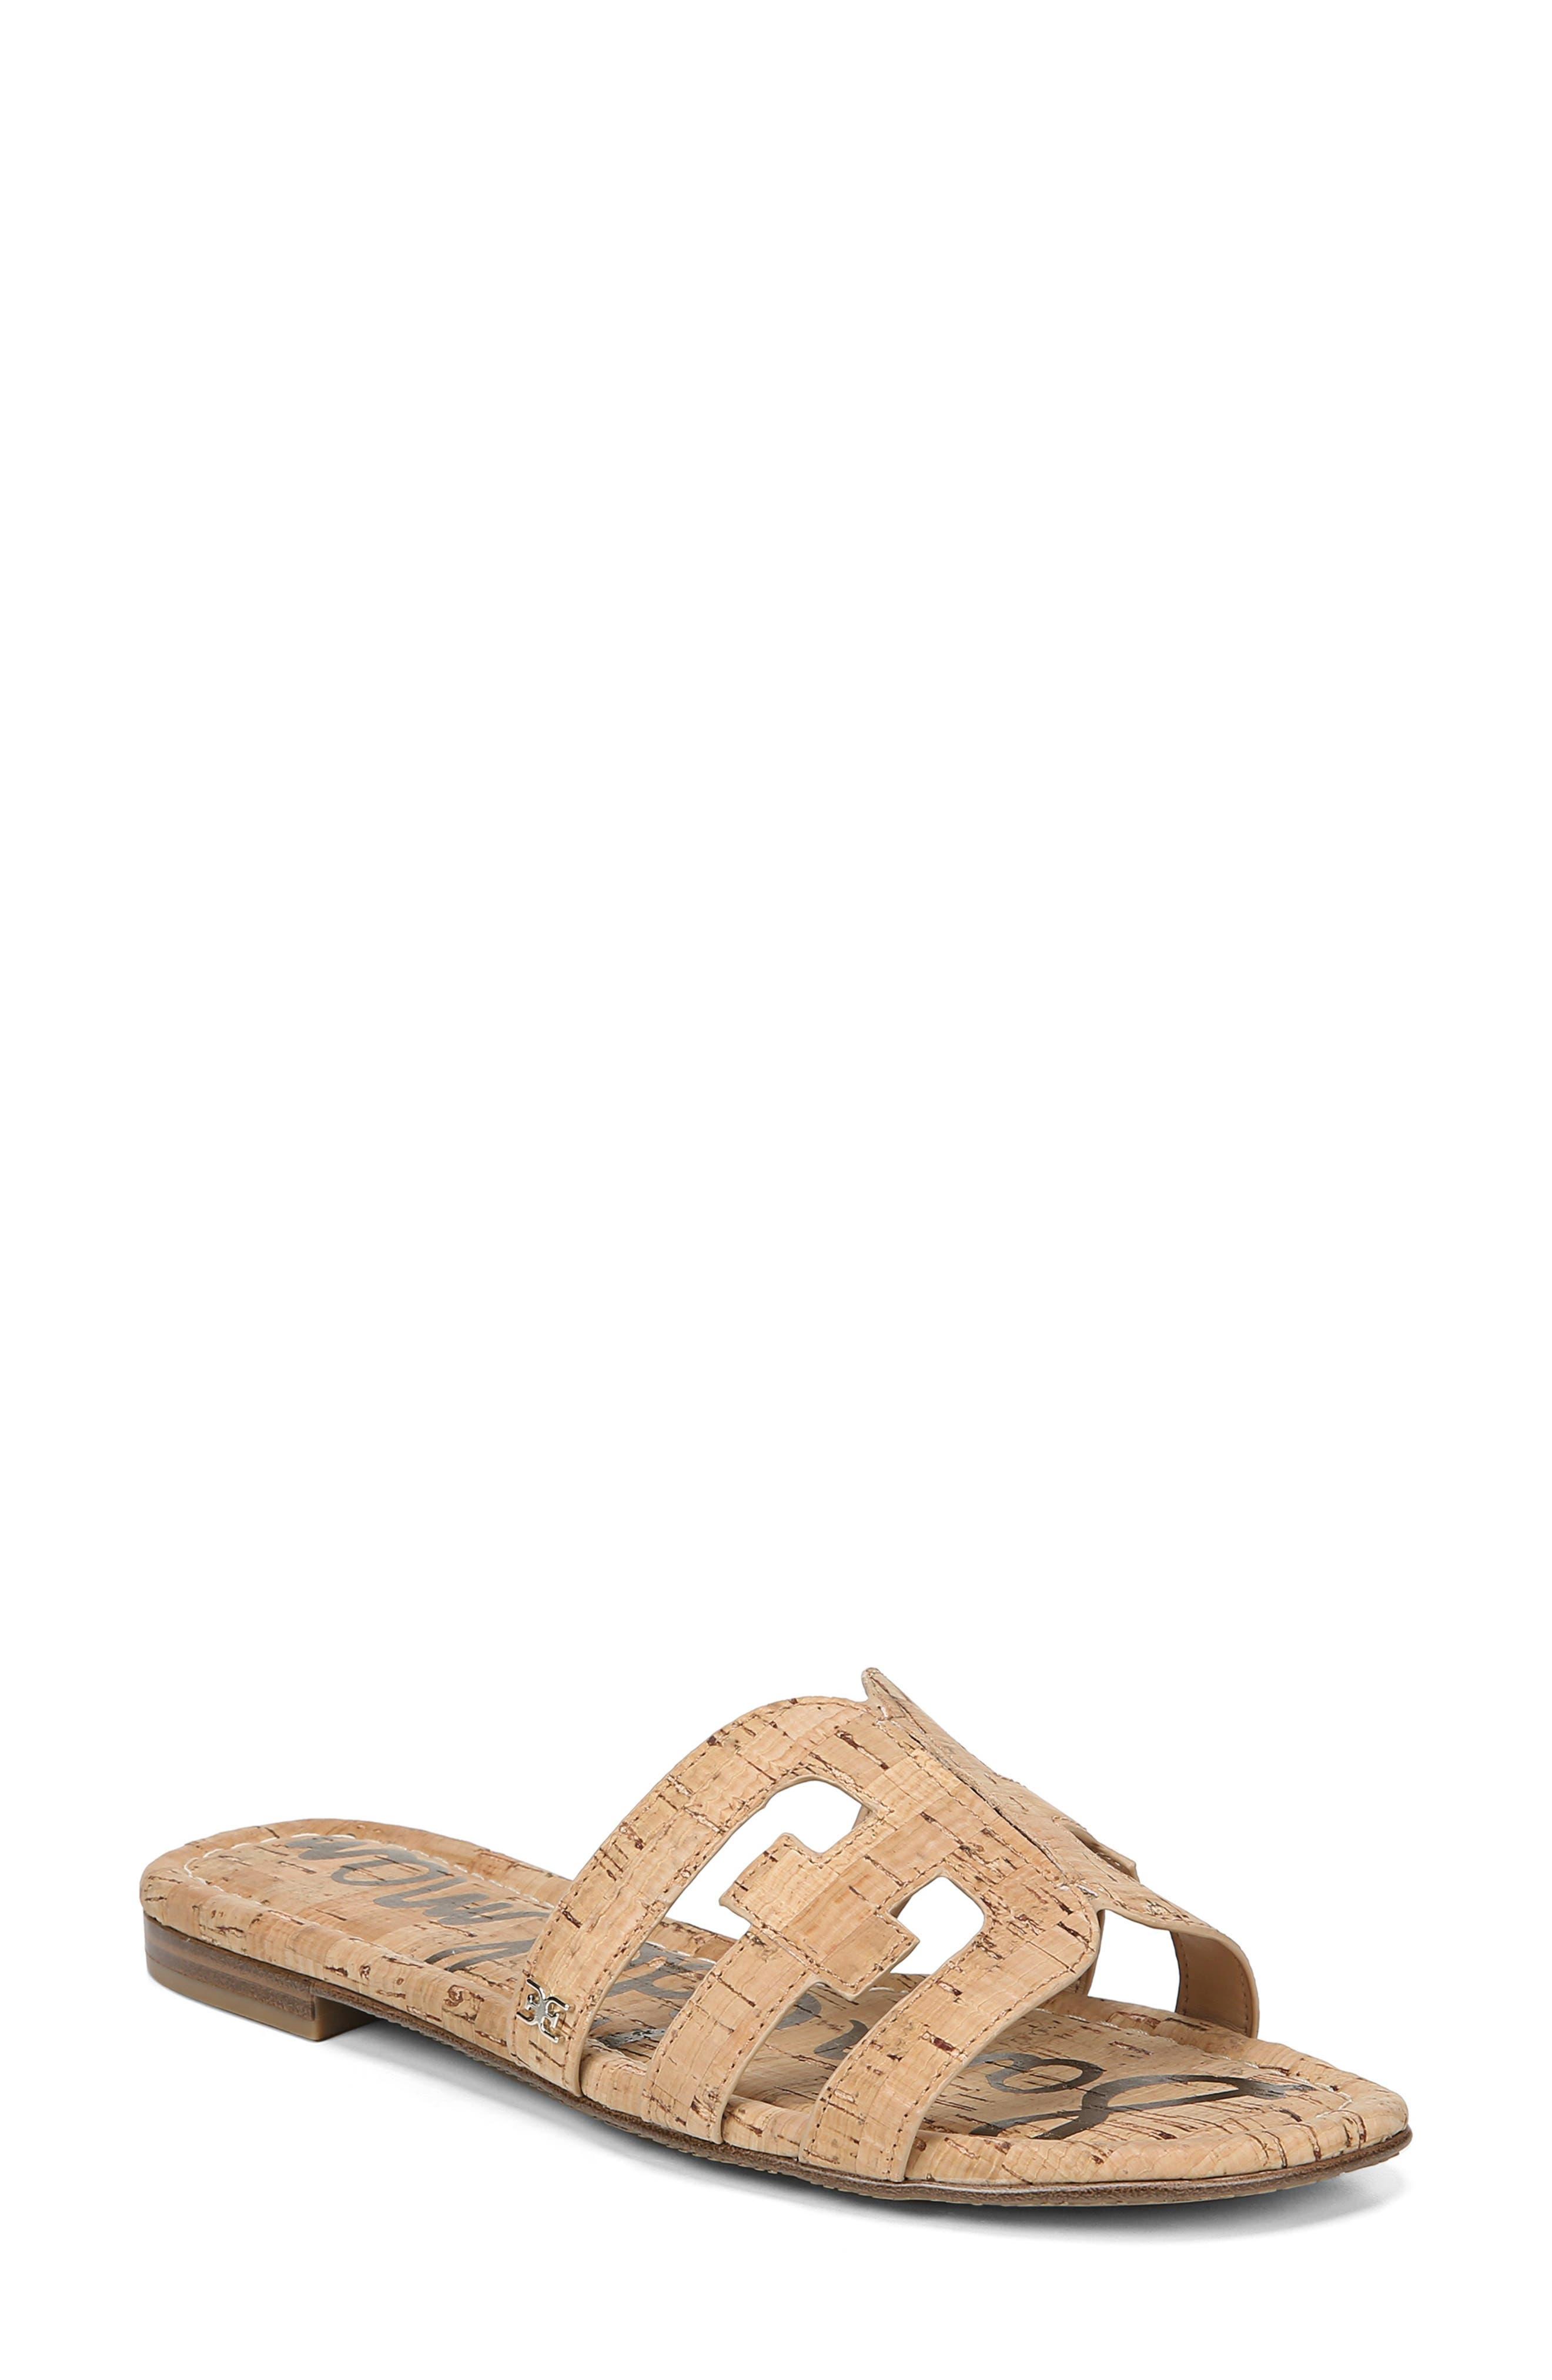 Bay Cutout Slide Sandal, Main, color, NATURAL